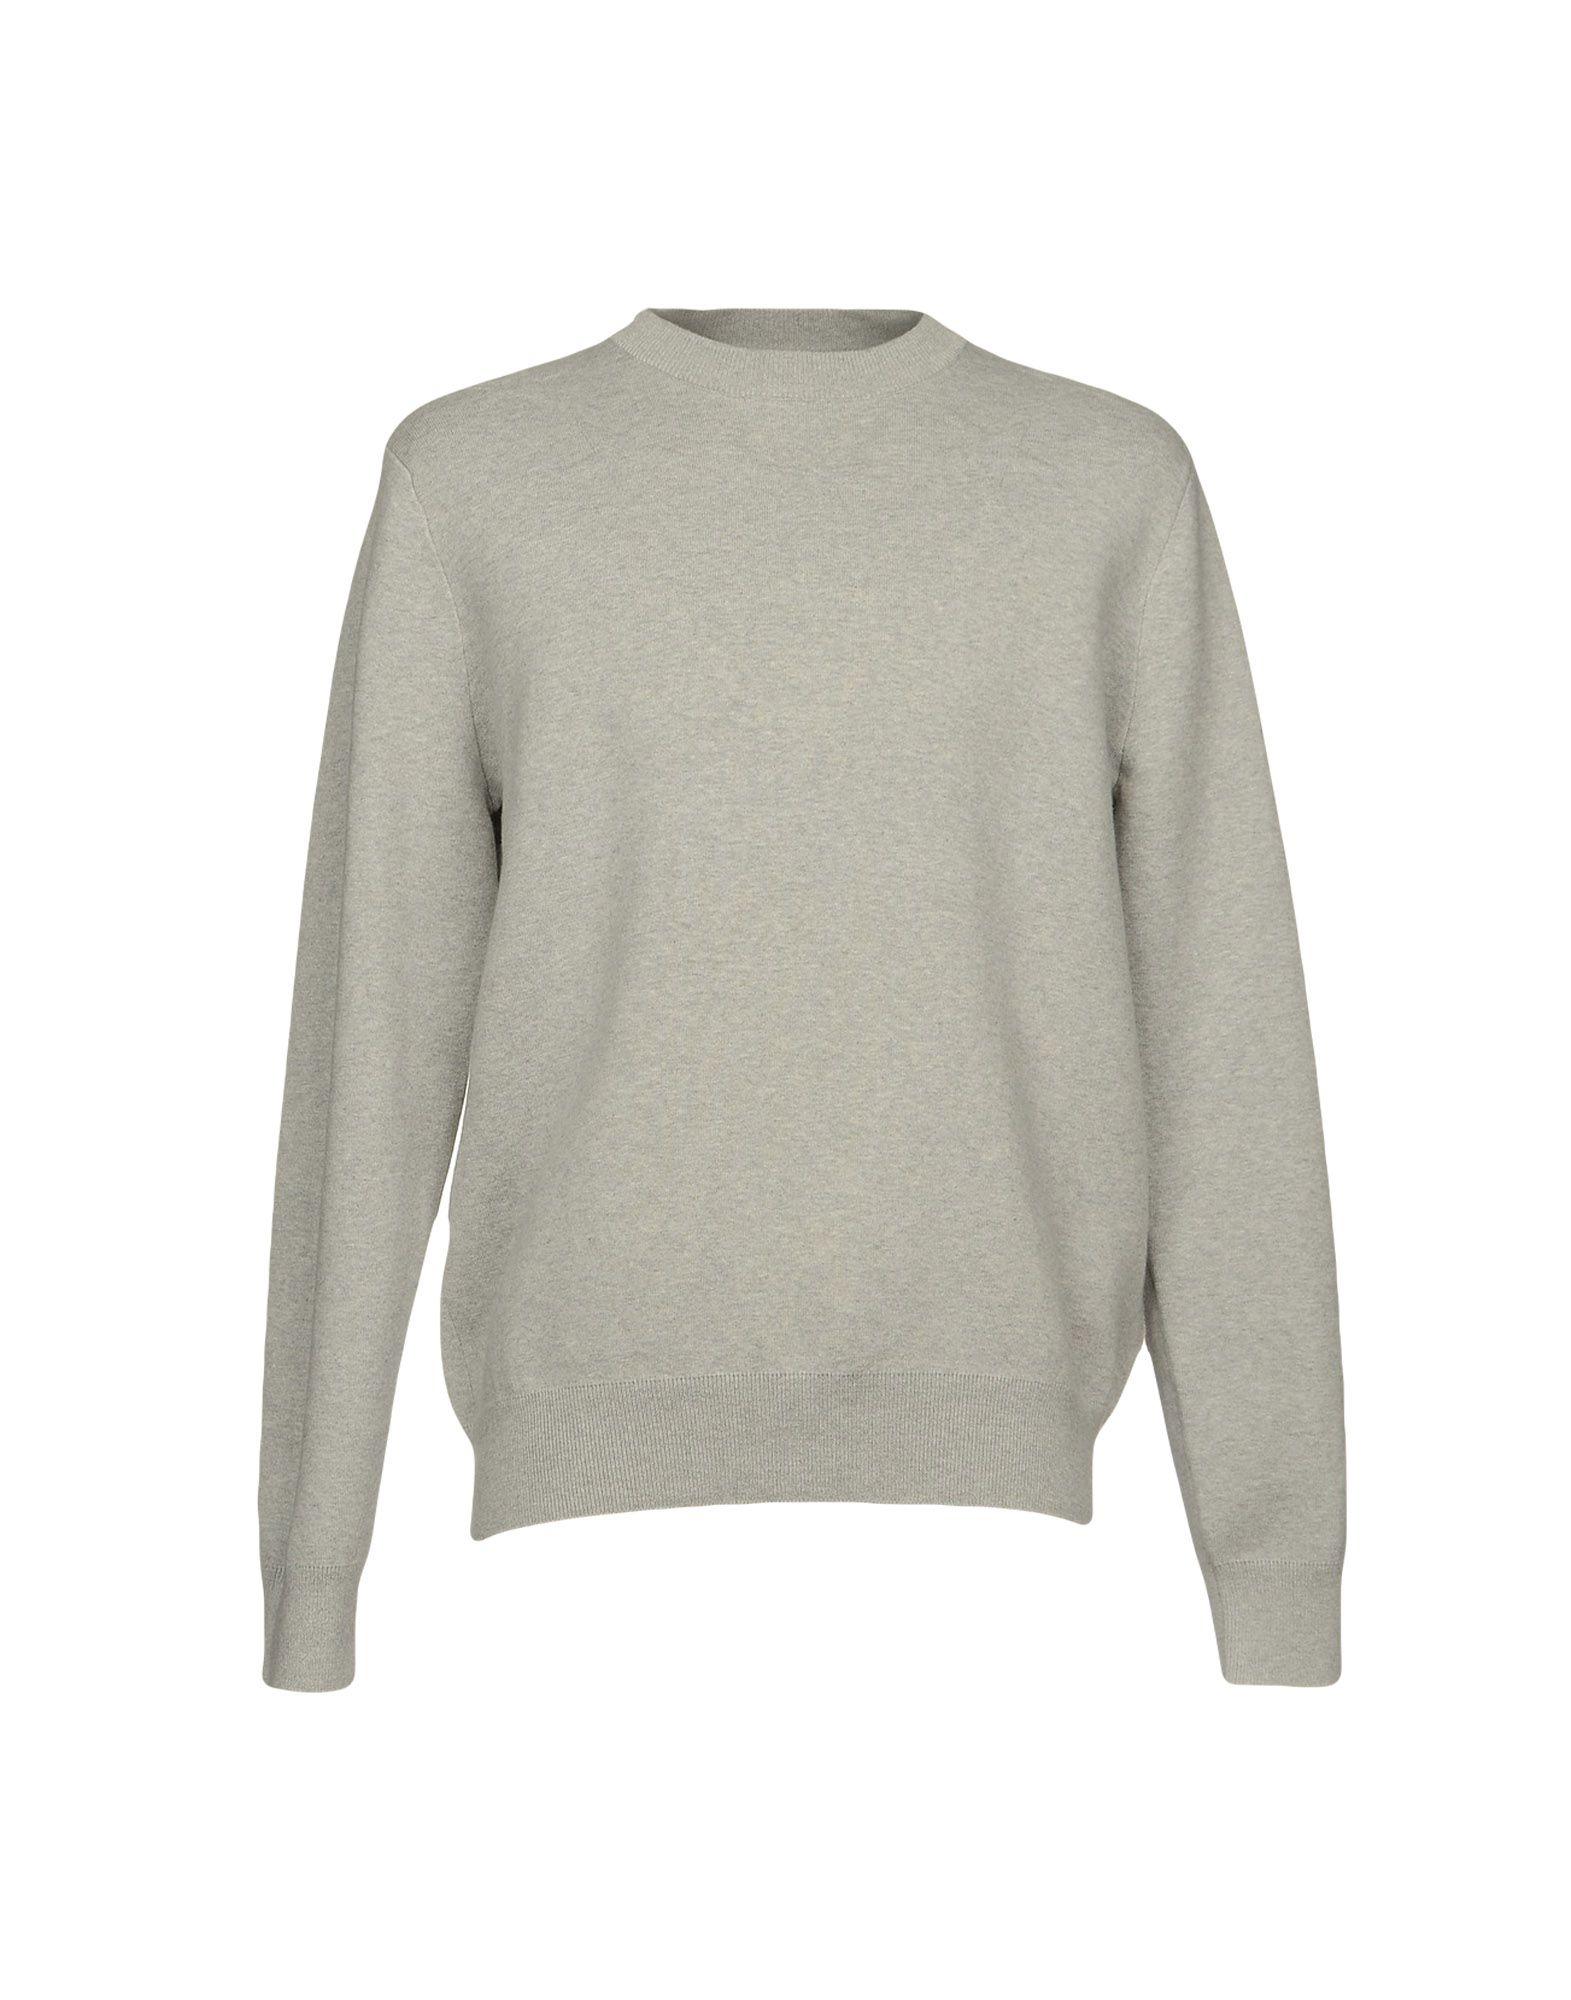 A buon mercato Pullover Givenchy Uomo - 39798462TG 39798462TG - 5f33a4